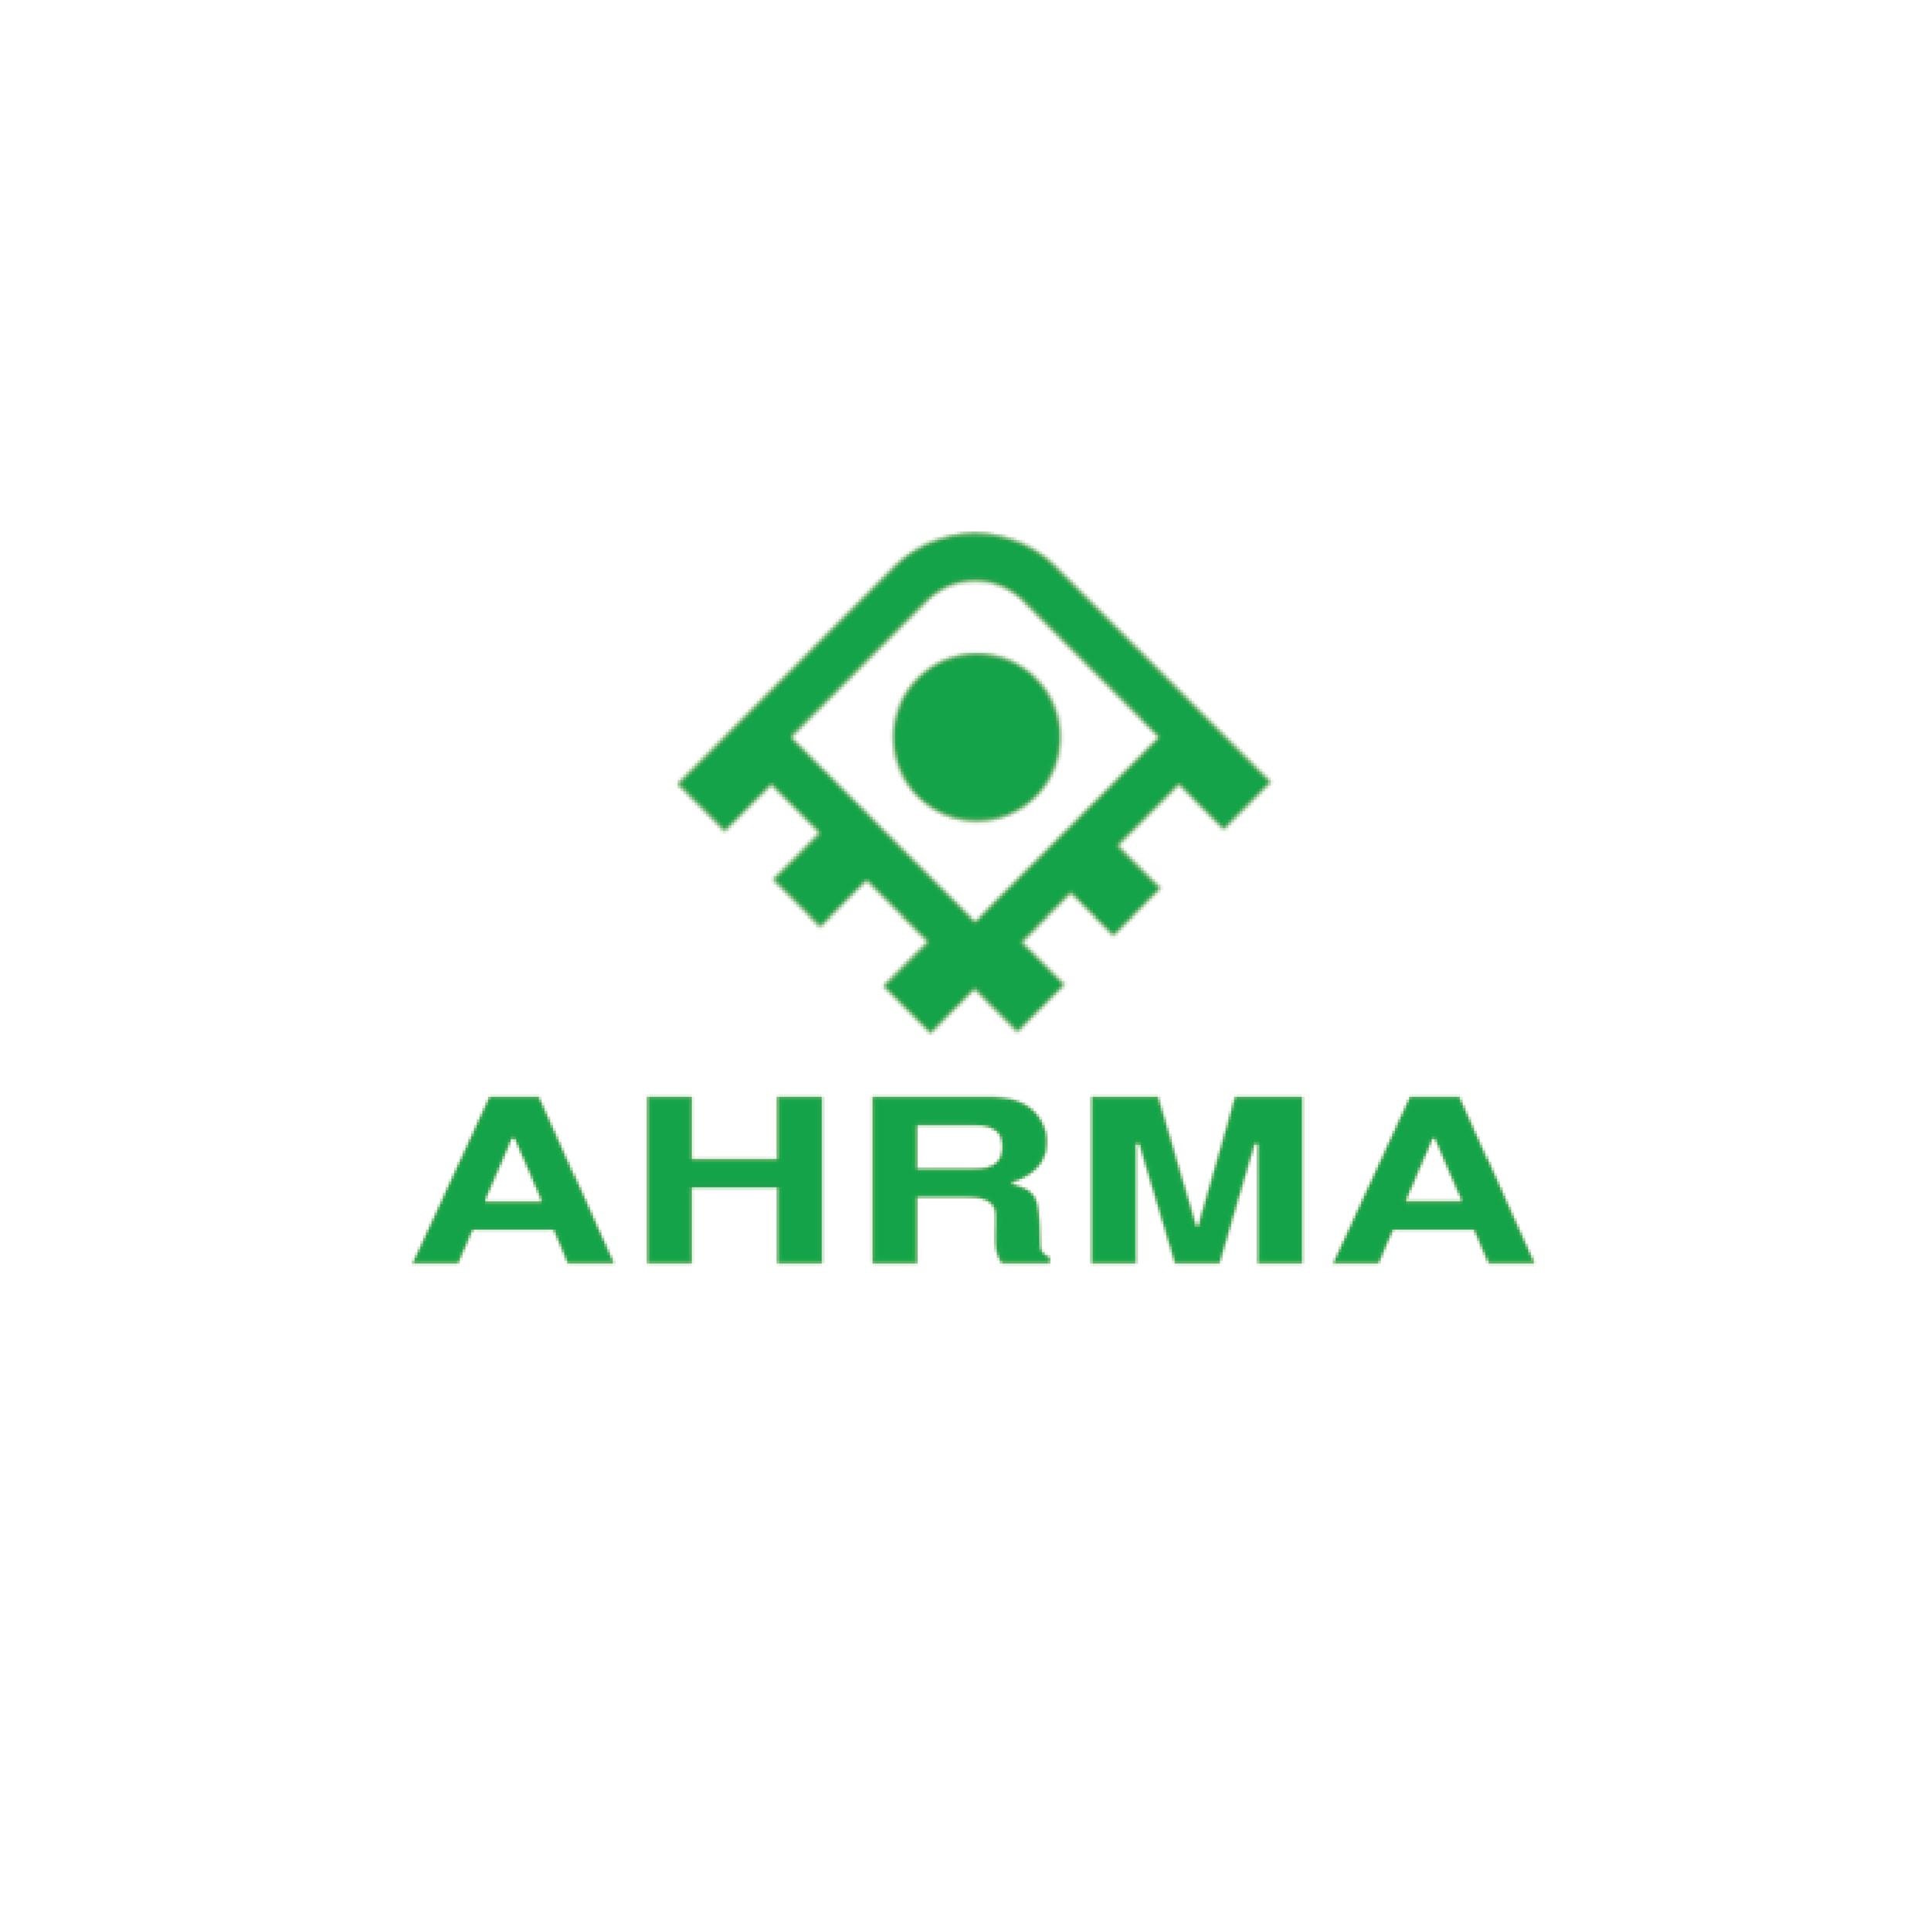 Ahrma Group